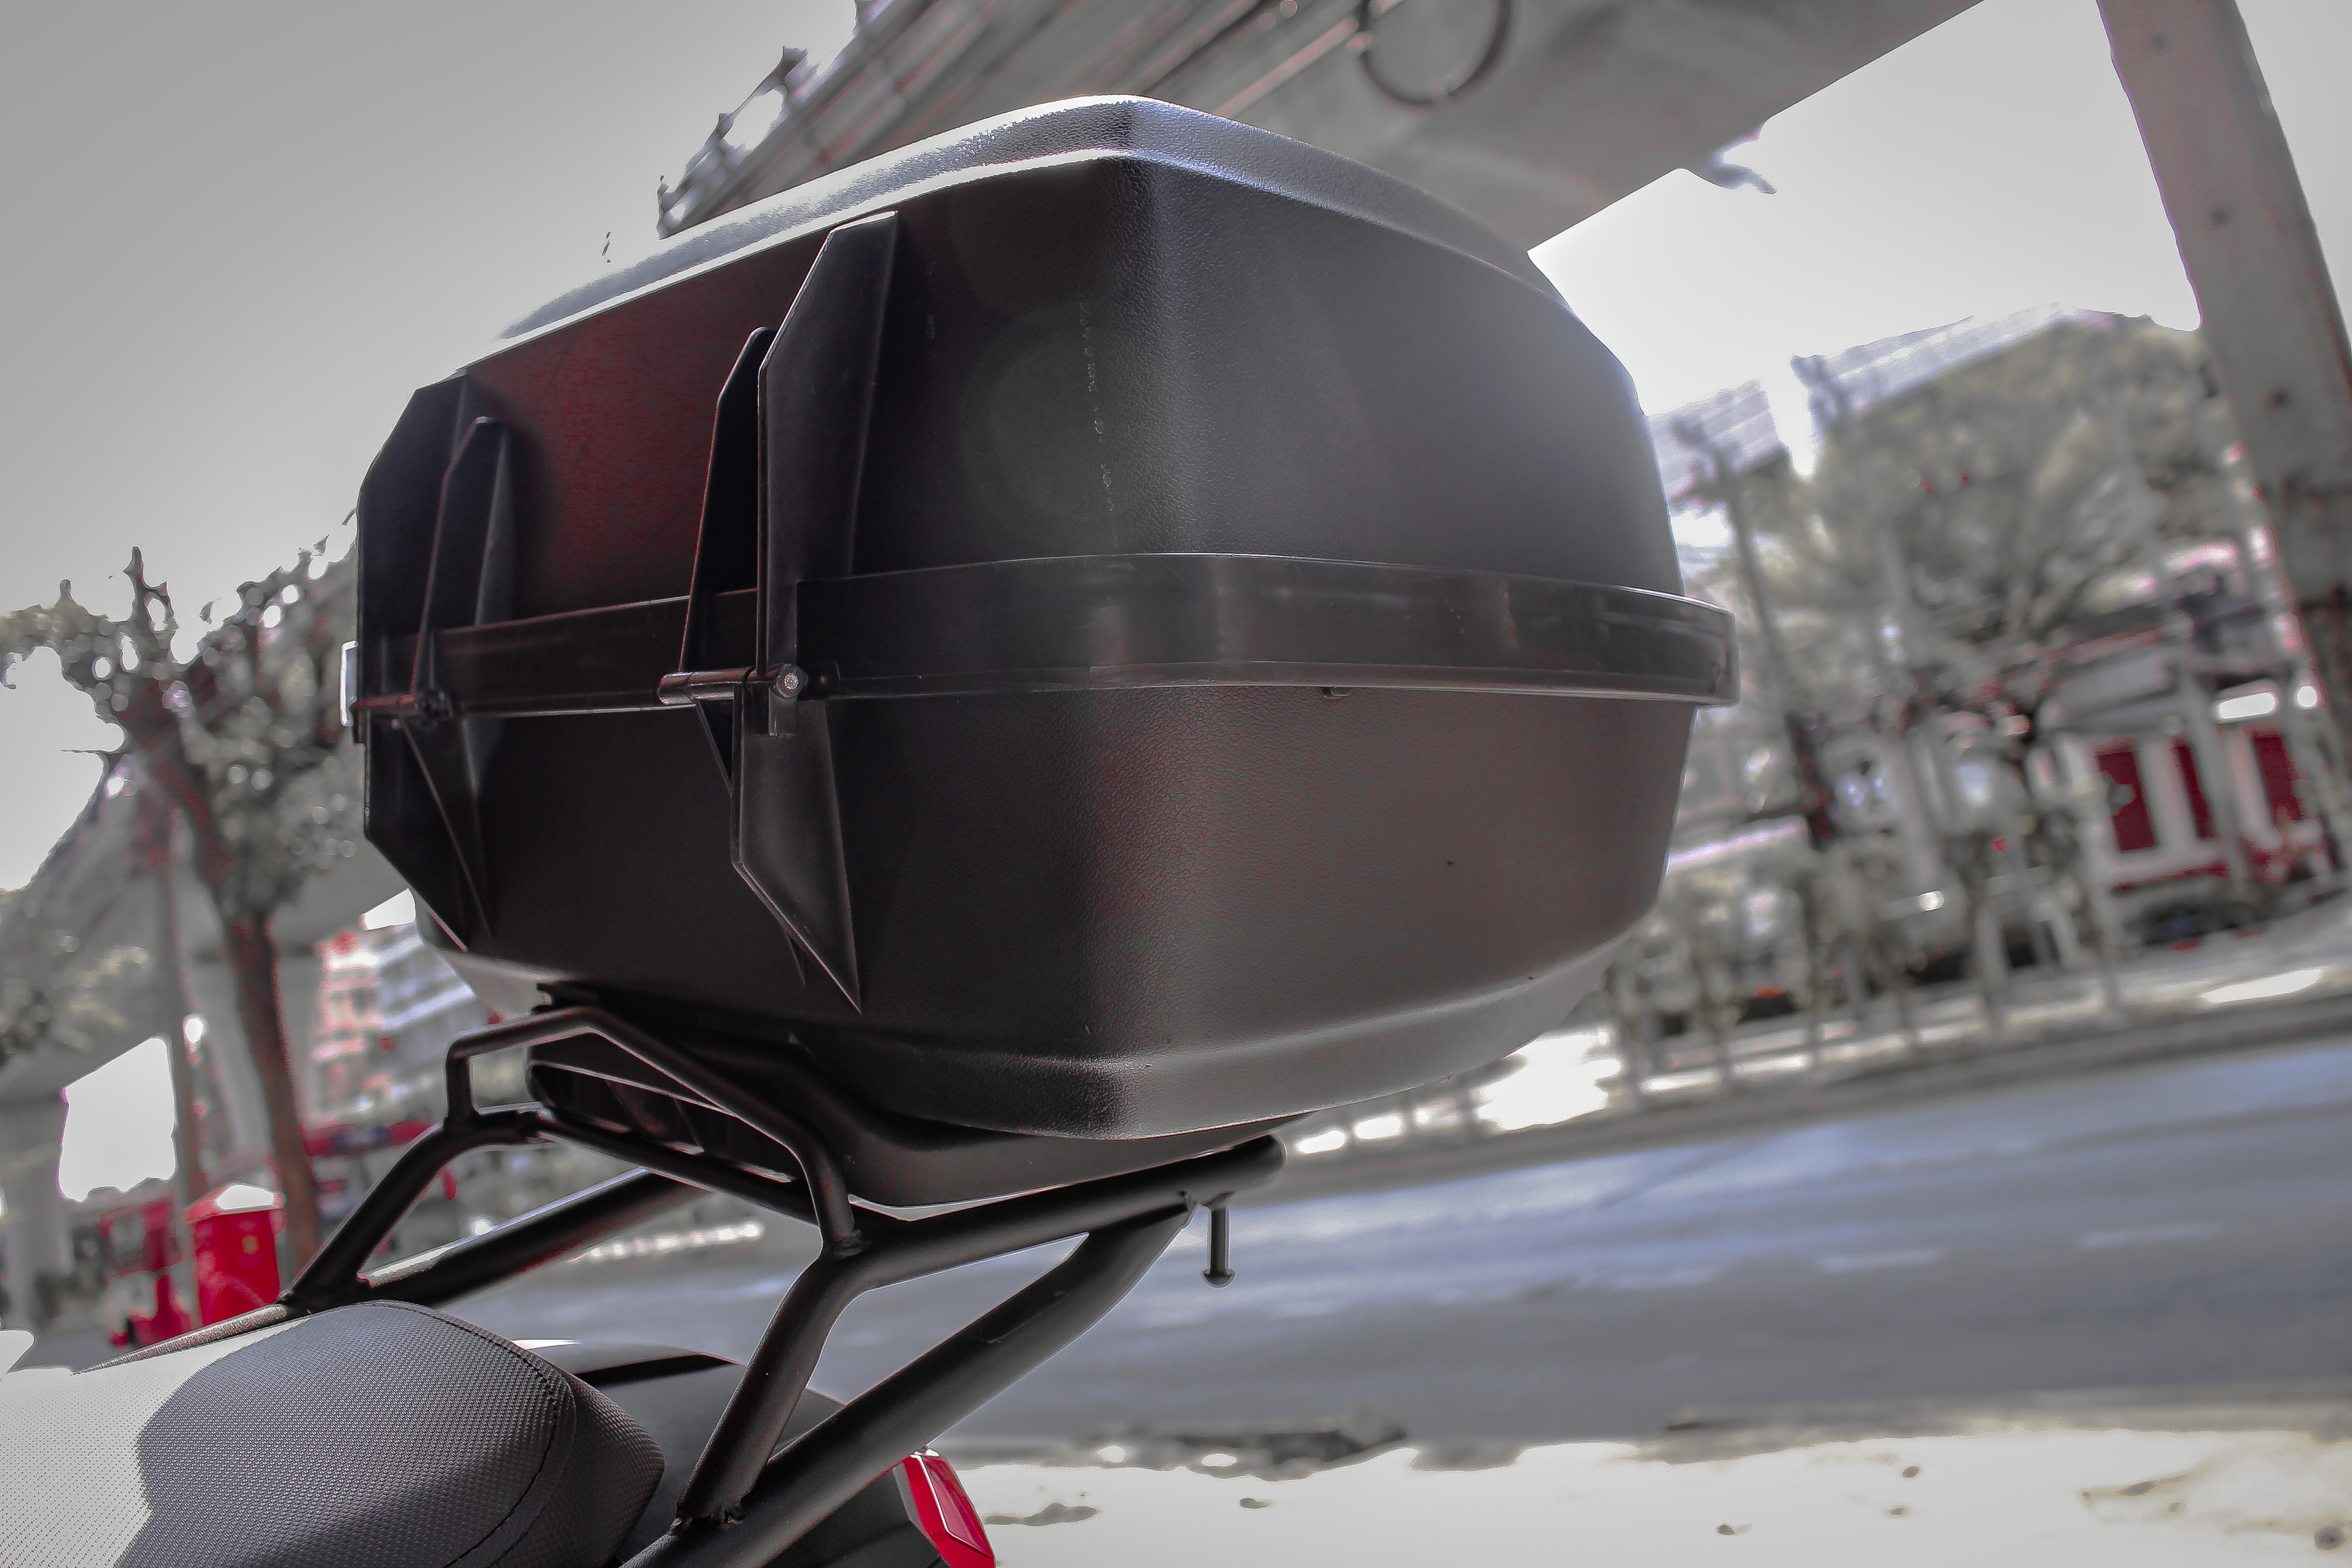 New ตะแกรงท้าย ADV-150 สำหรับ ฮีโร่สายแบก